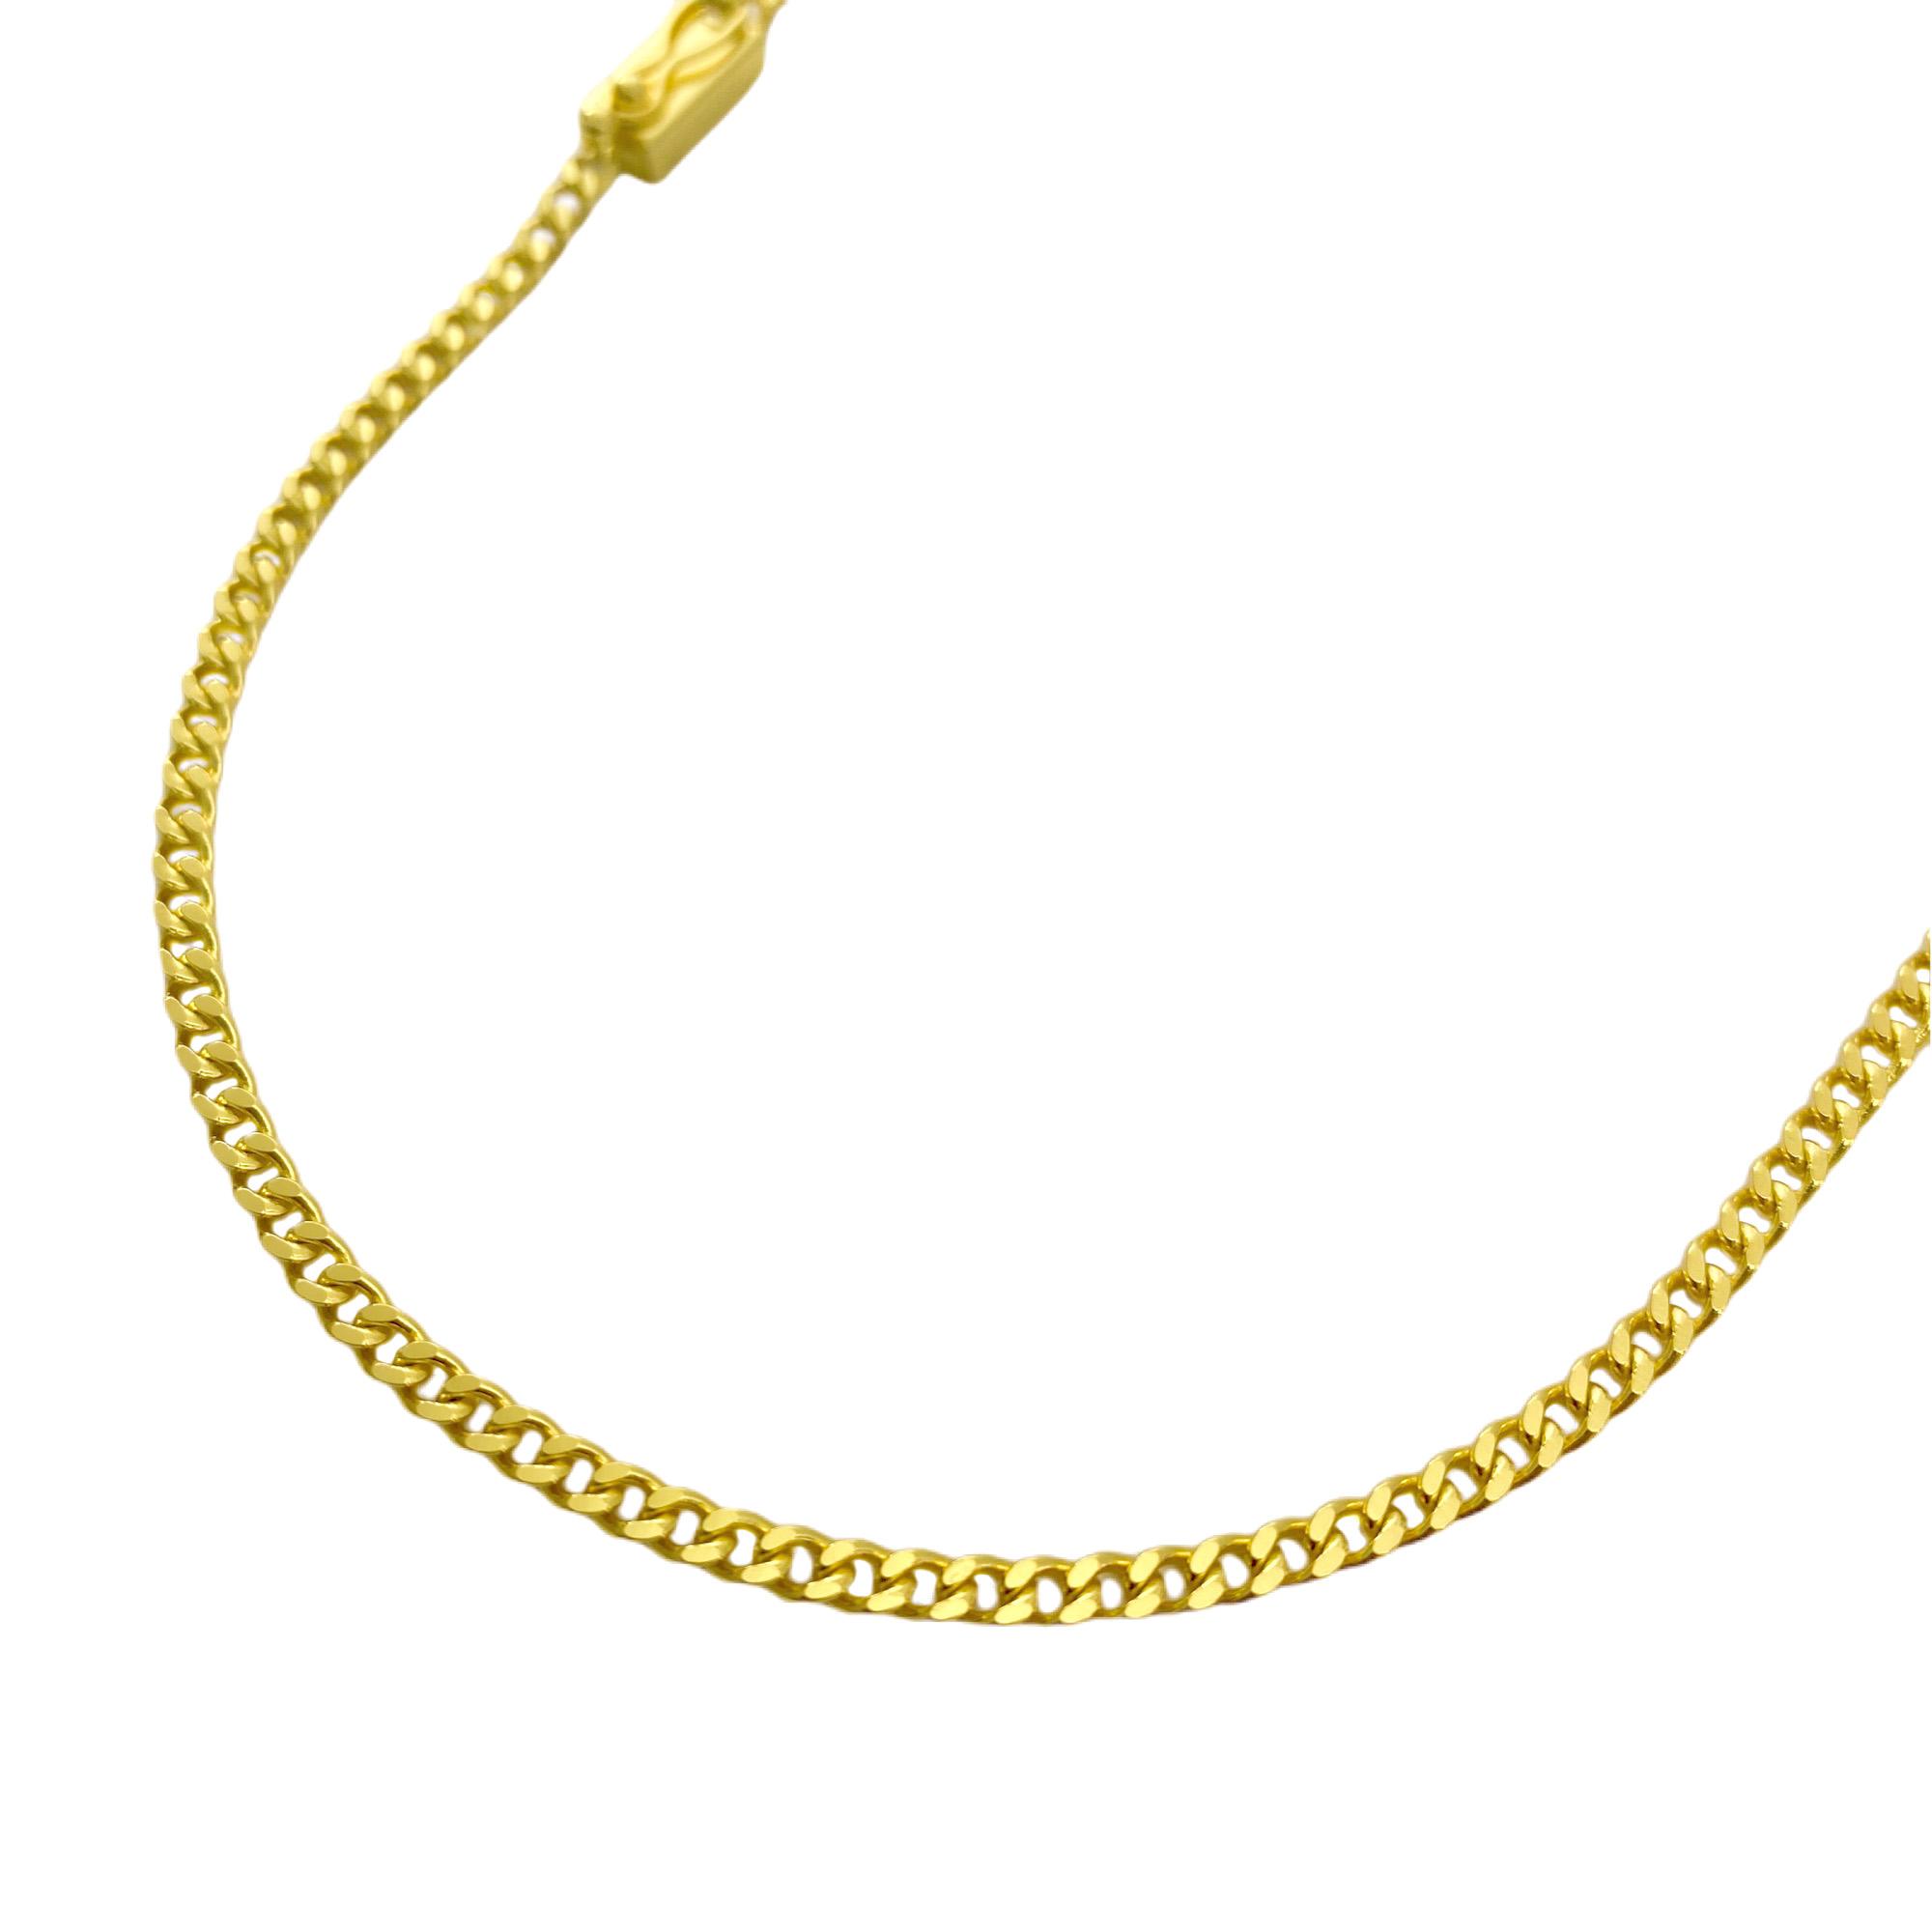 Corrente Grumet 2,5mm 70cm (7,3g) (Fecho Gaveta) (Banho Ouro 24k)